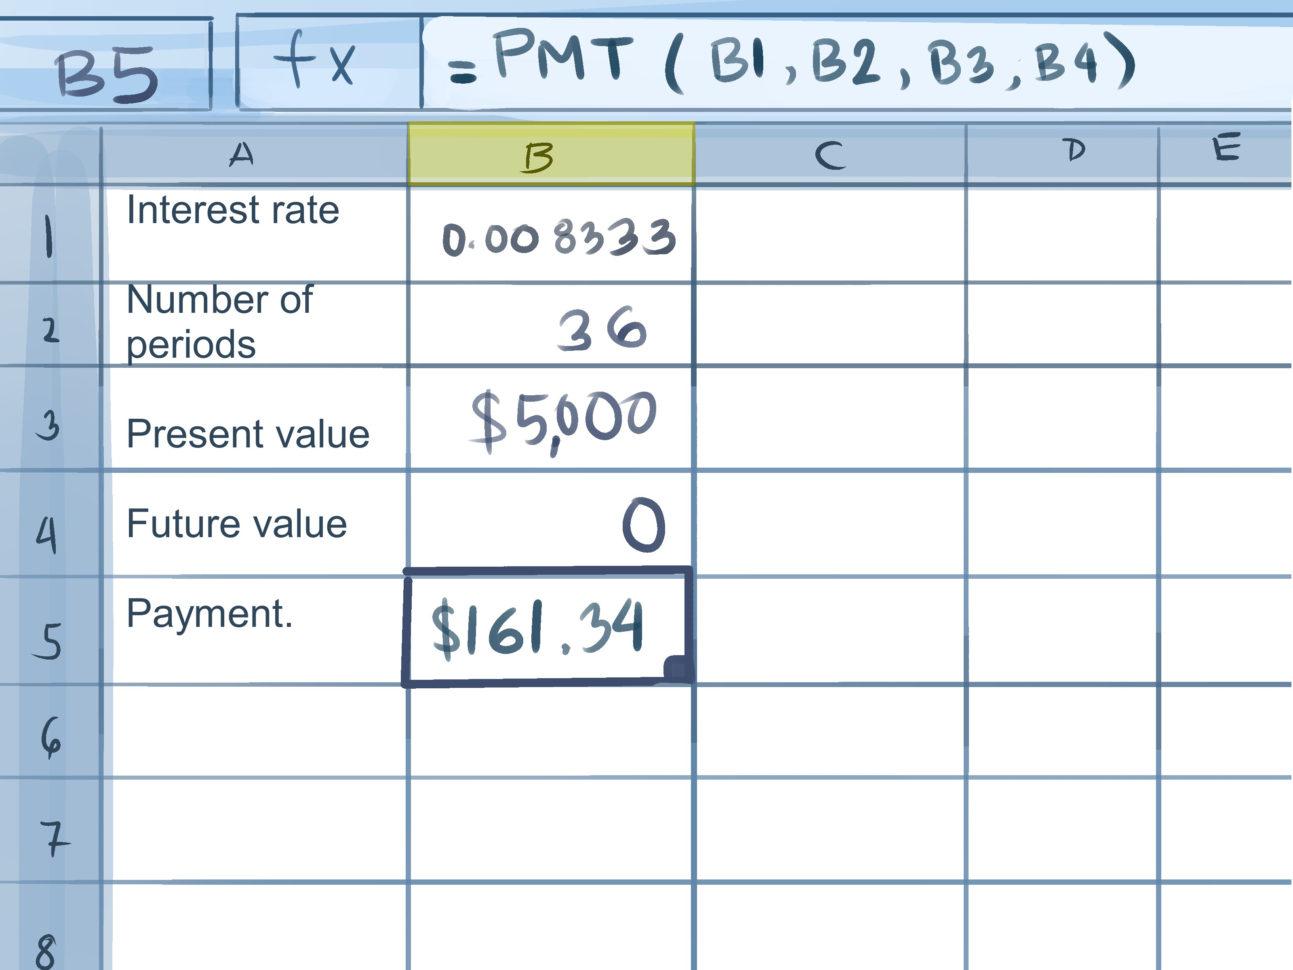 Credit Card Repayment Calculator Spreadsheet Regarding How